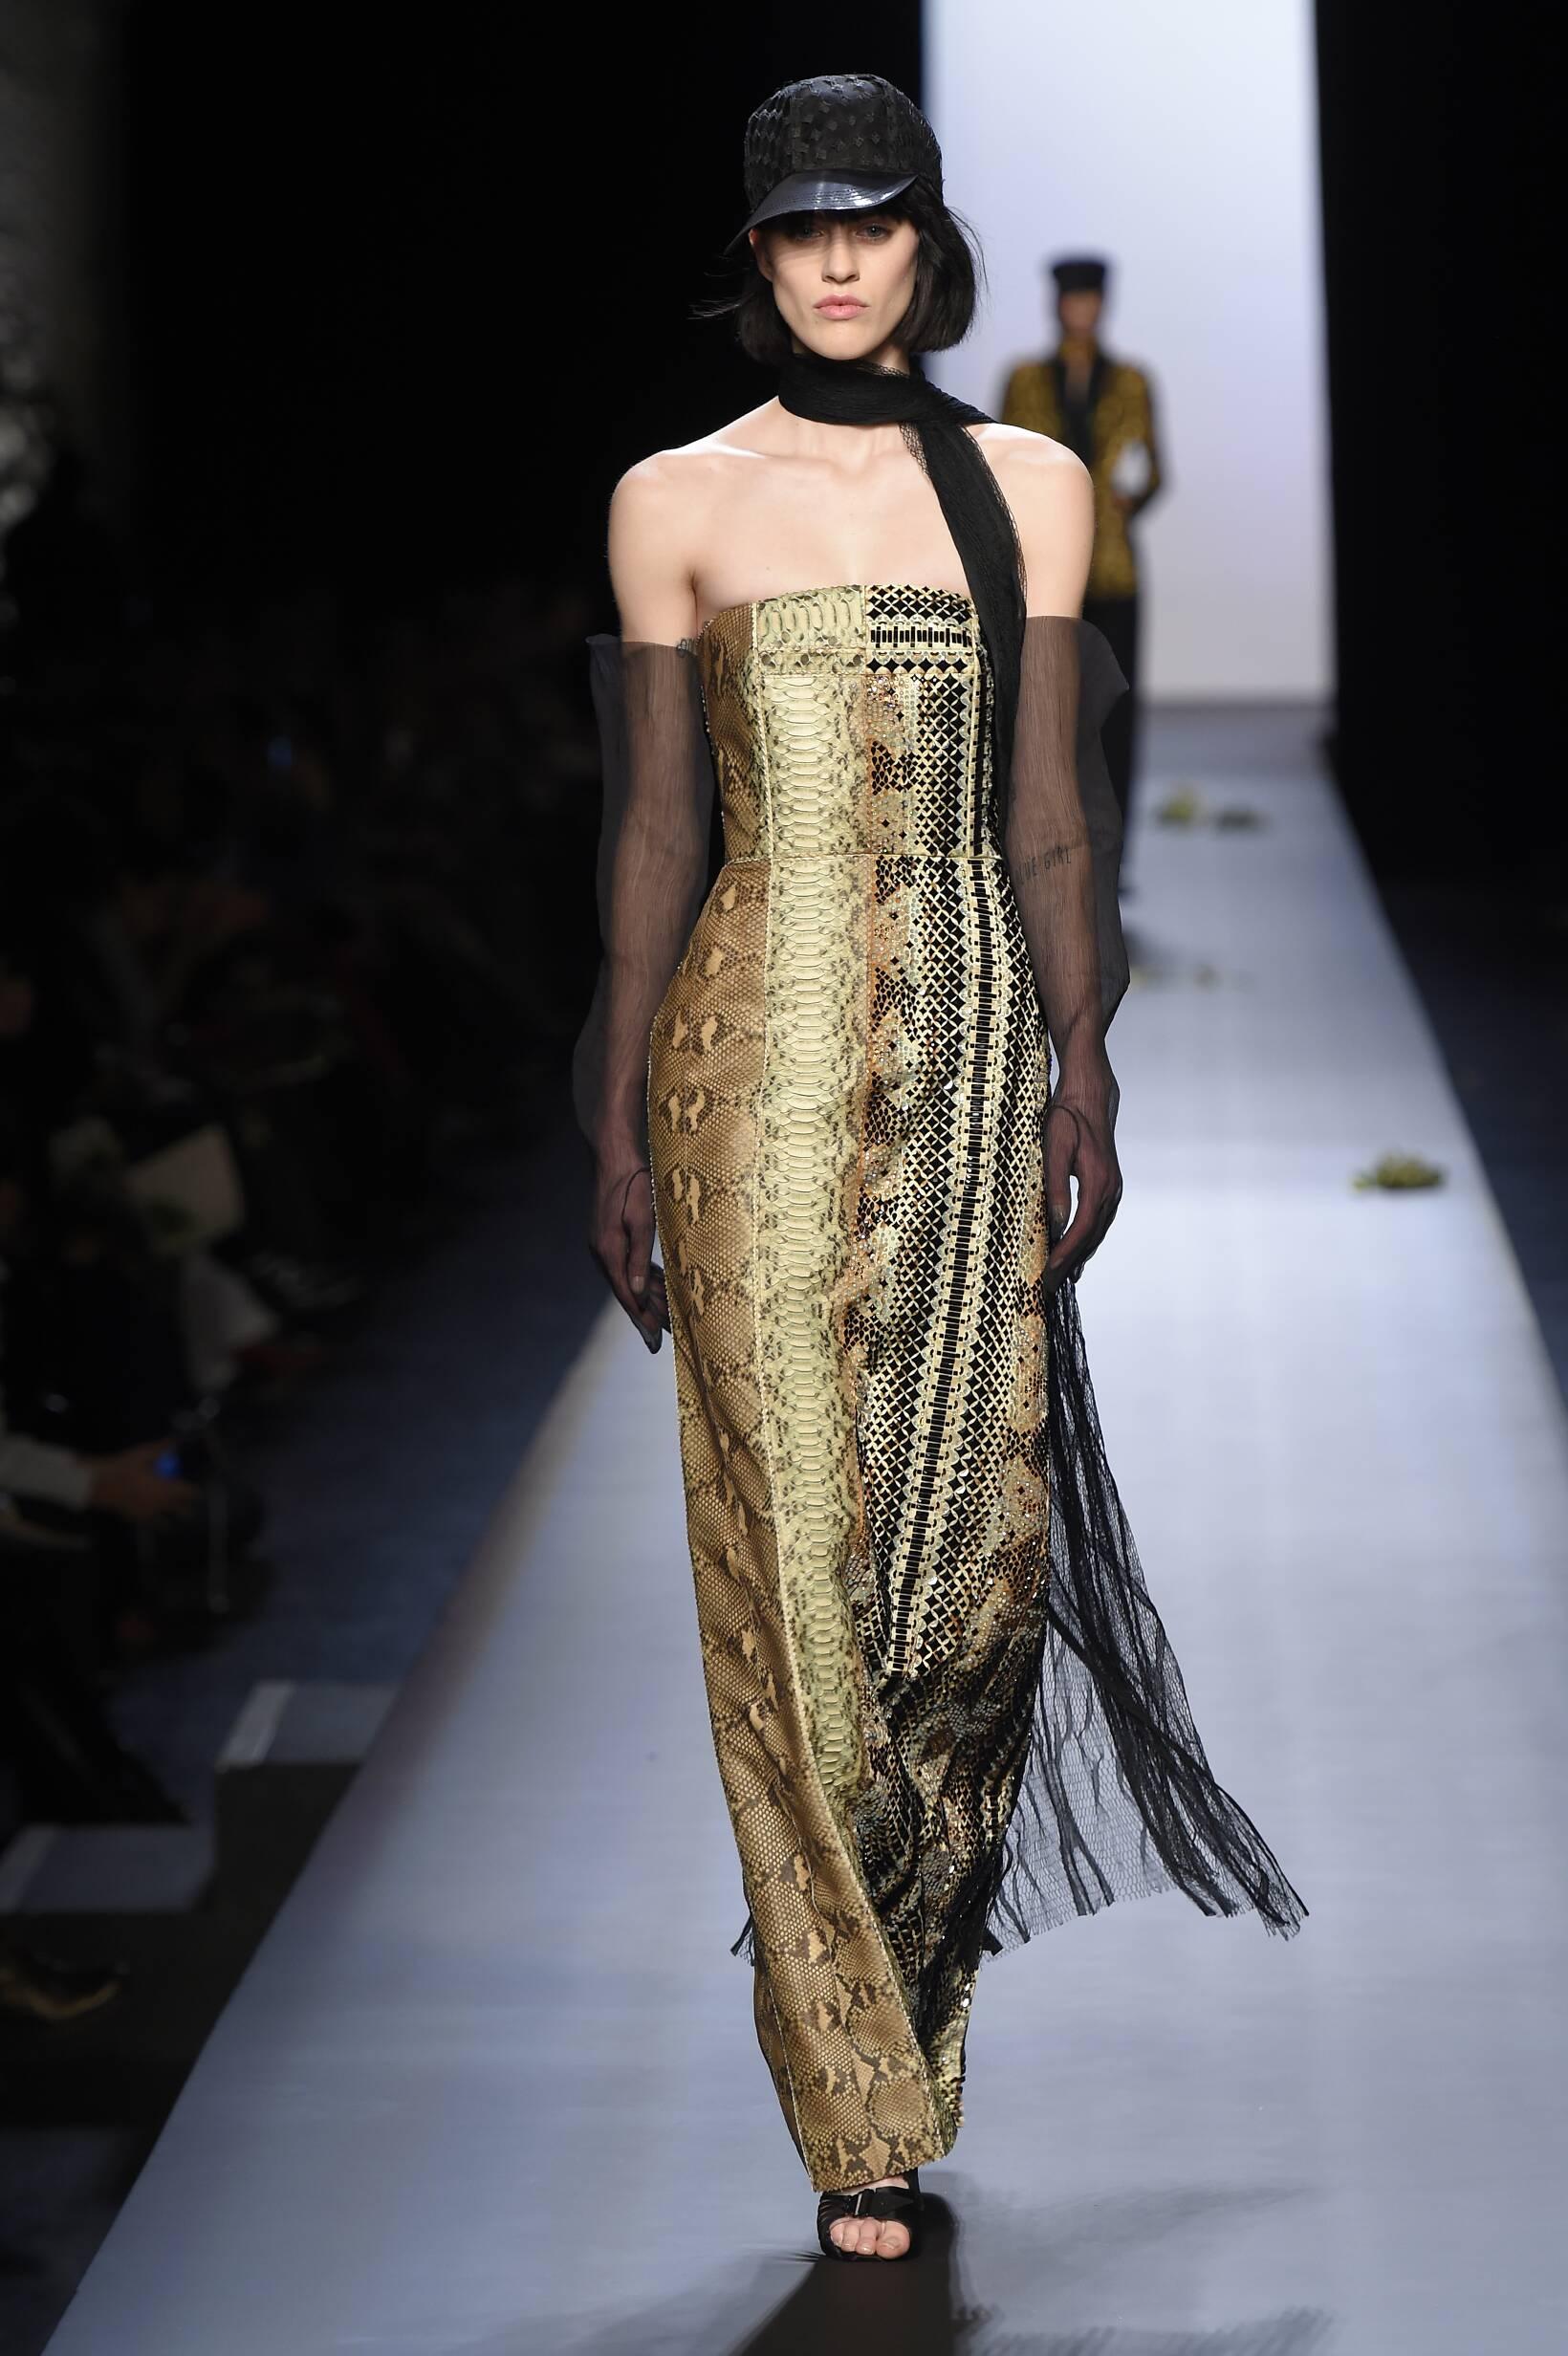 Jean Paul Gaultier Haute Couture Collection Women's SS 2015 Fashion Show